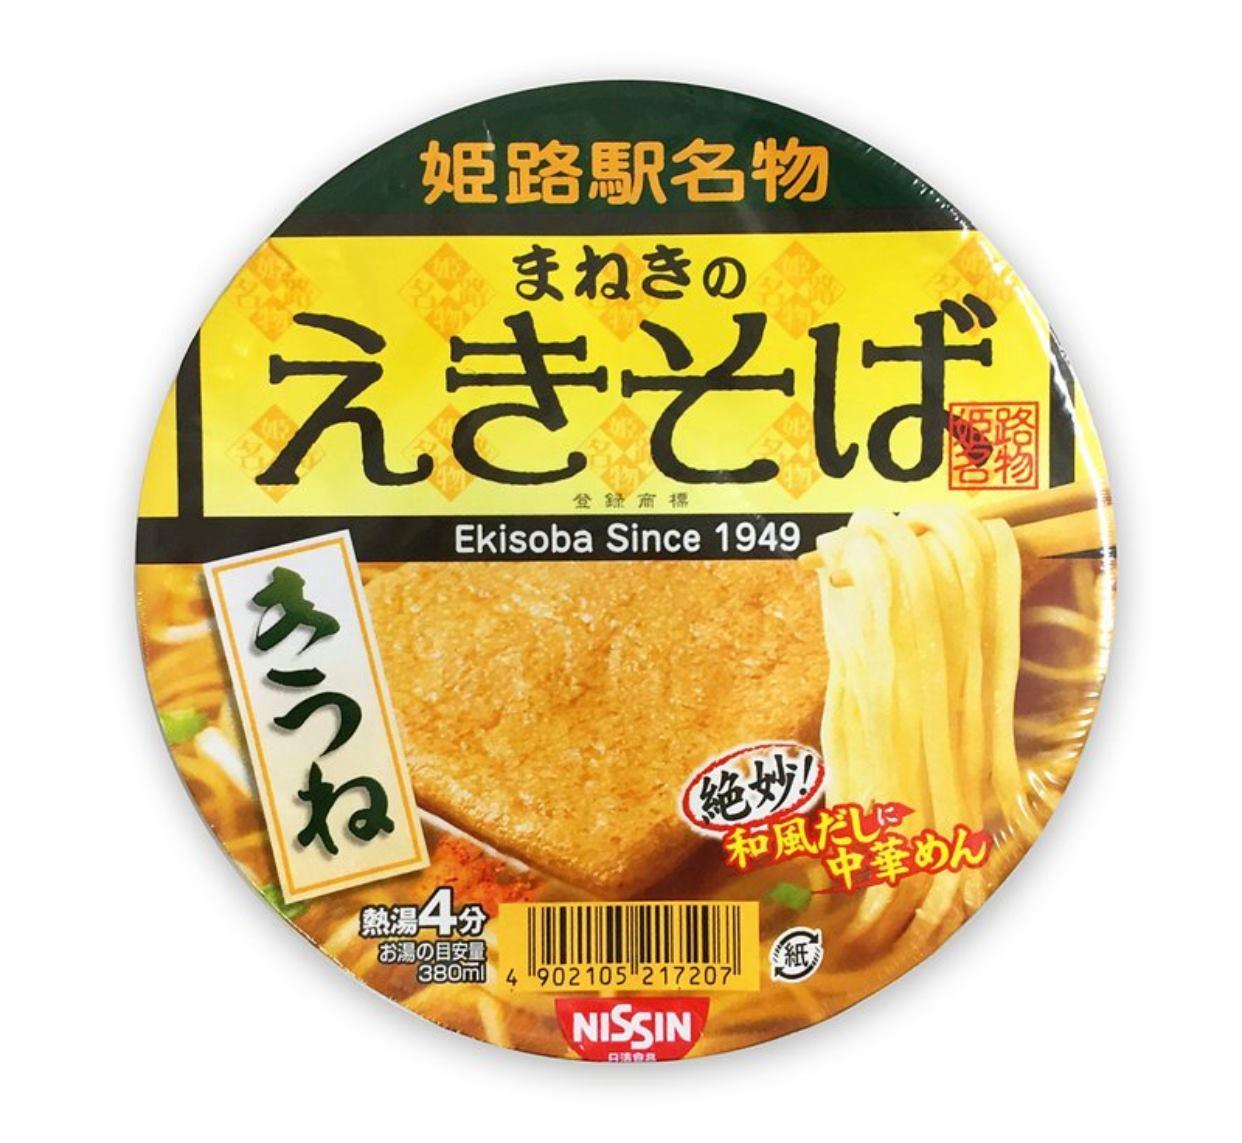 日清NISSIN 姬路月台拉麵 - 豆皮碗麵 83g